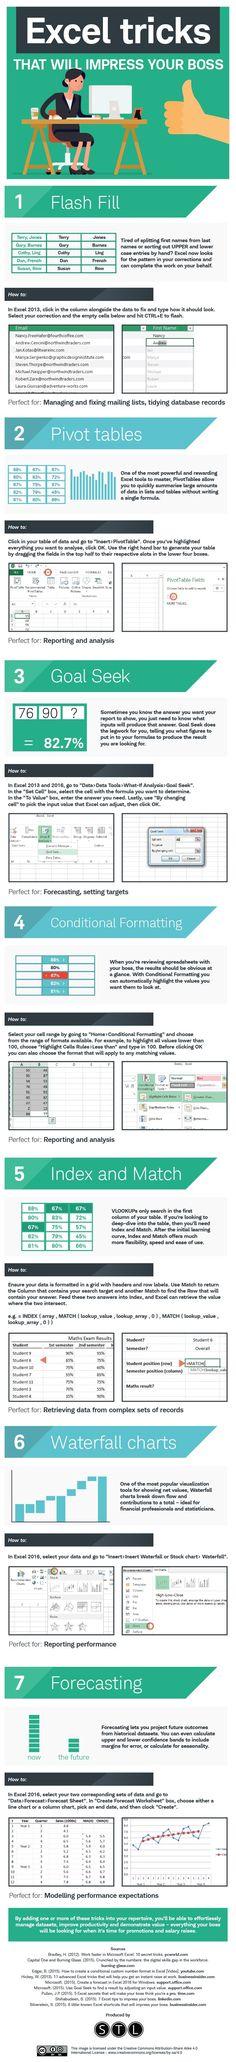 7 Handy Excel Tricks That'll Impress Your Boss [Infographic] — Medium